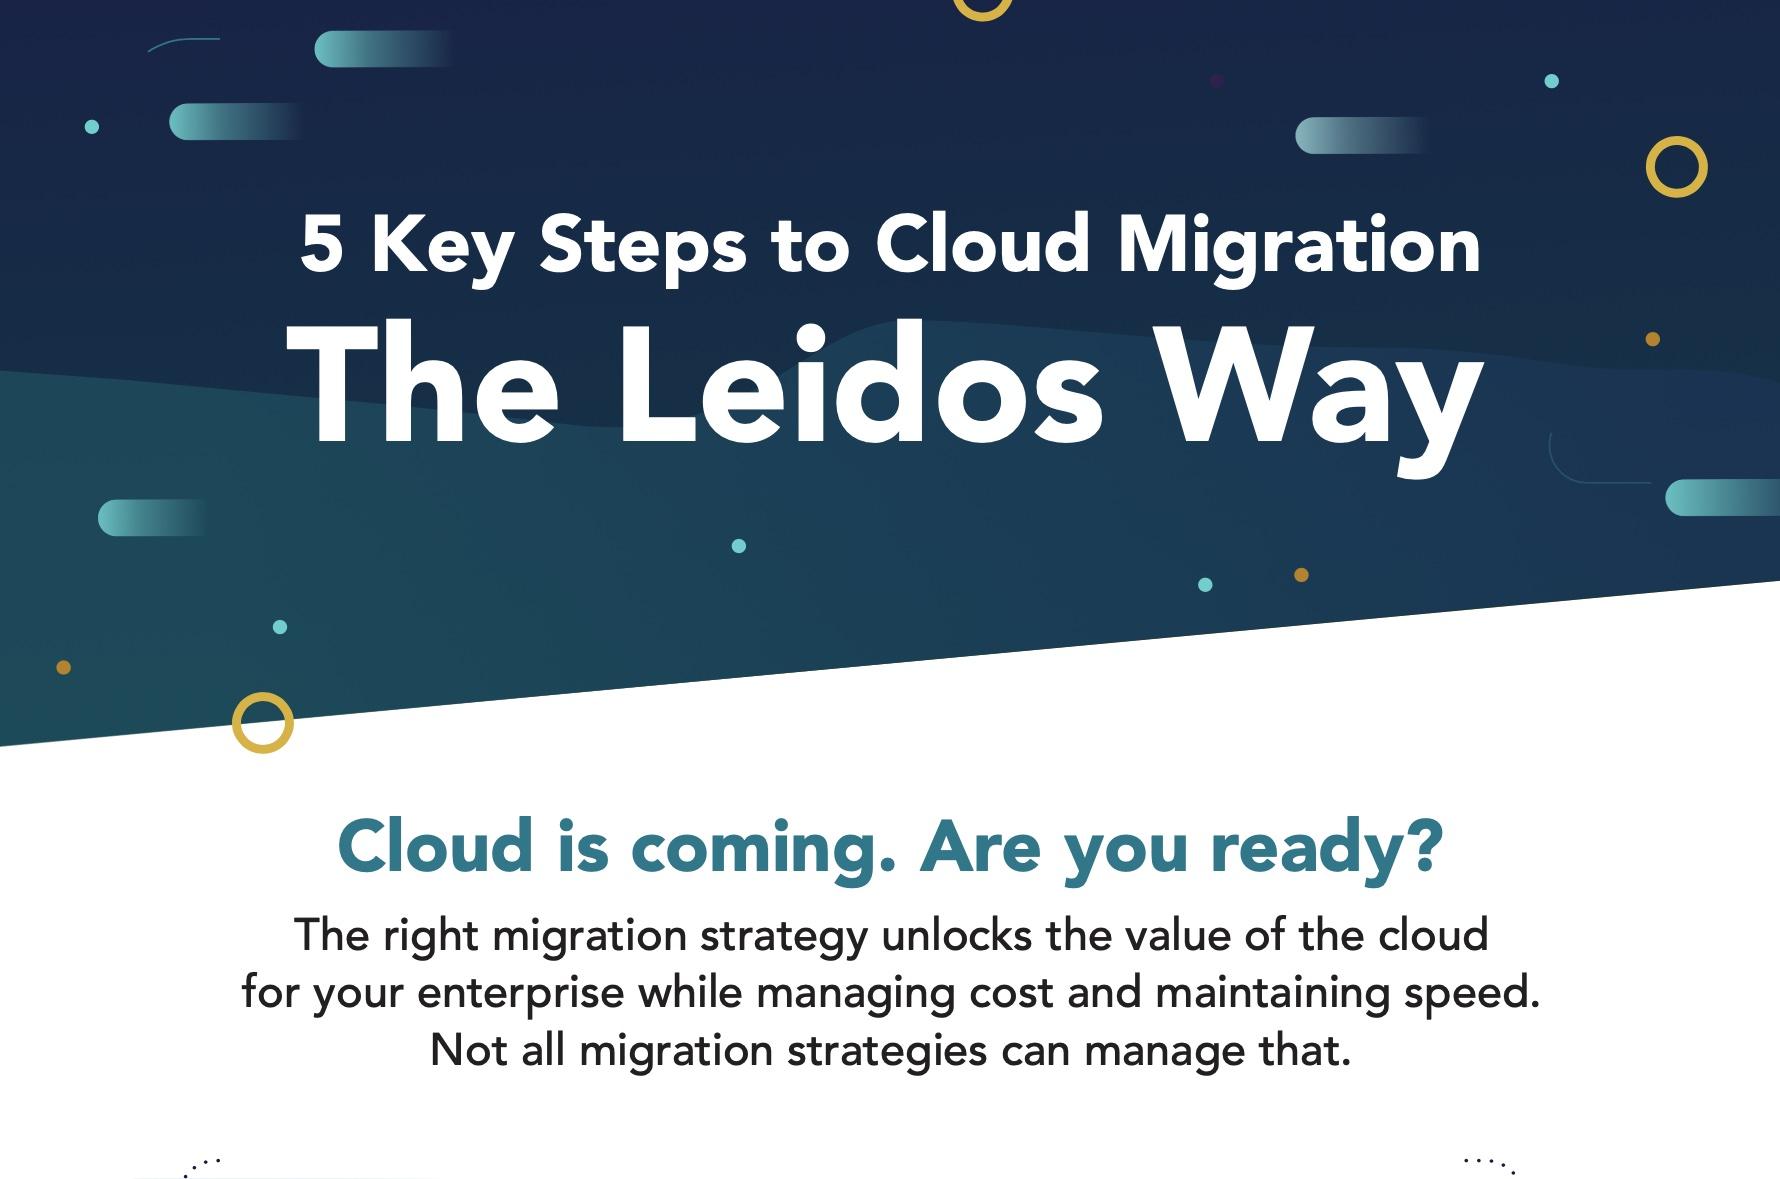 Five Key Steps to Cloud Migration